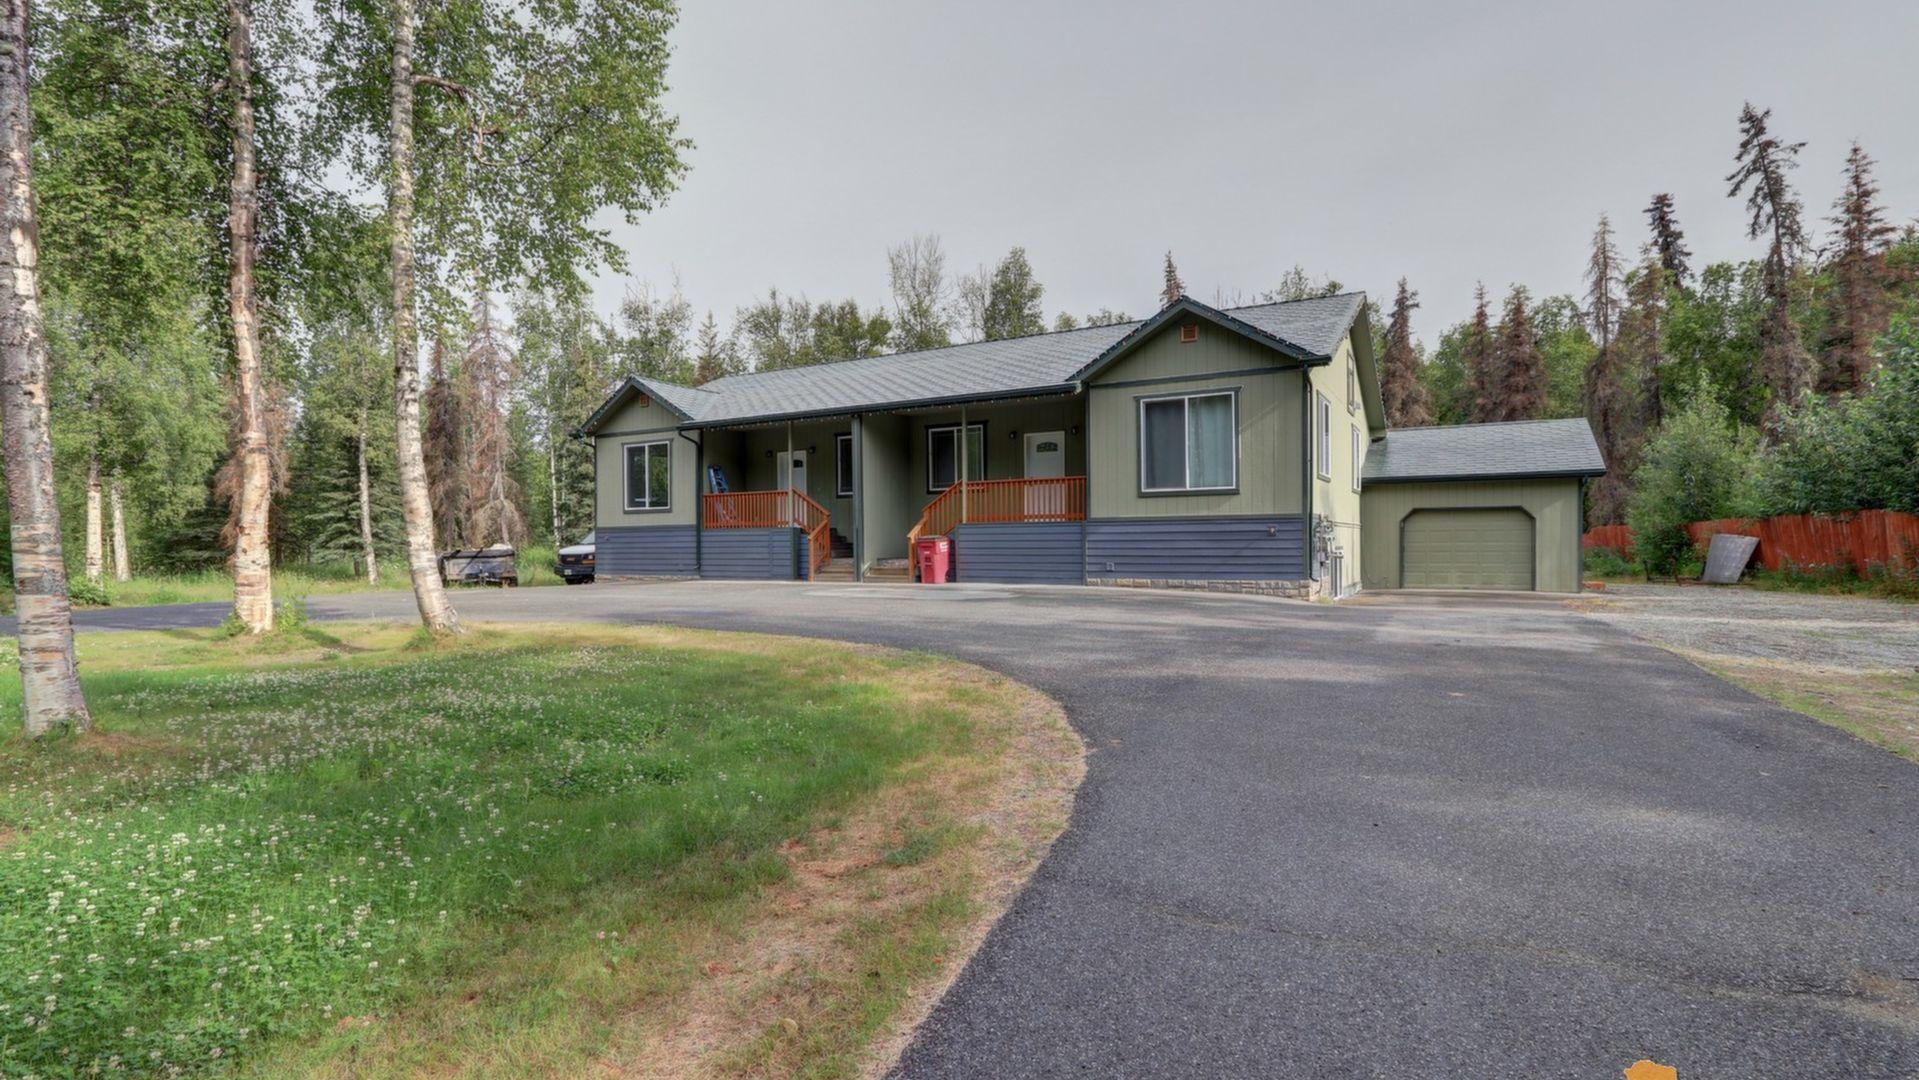 homes for sale eagle river ak 99577